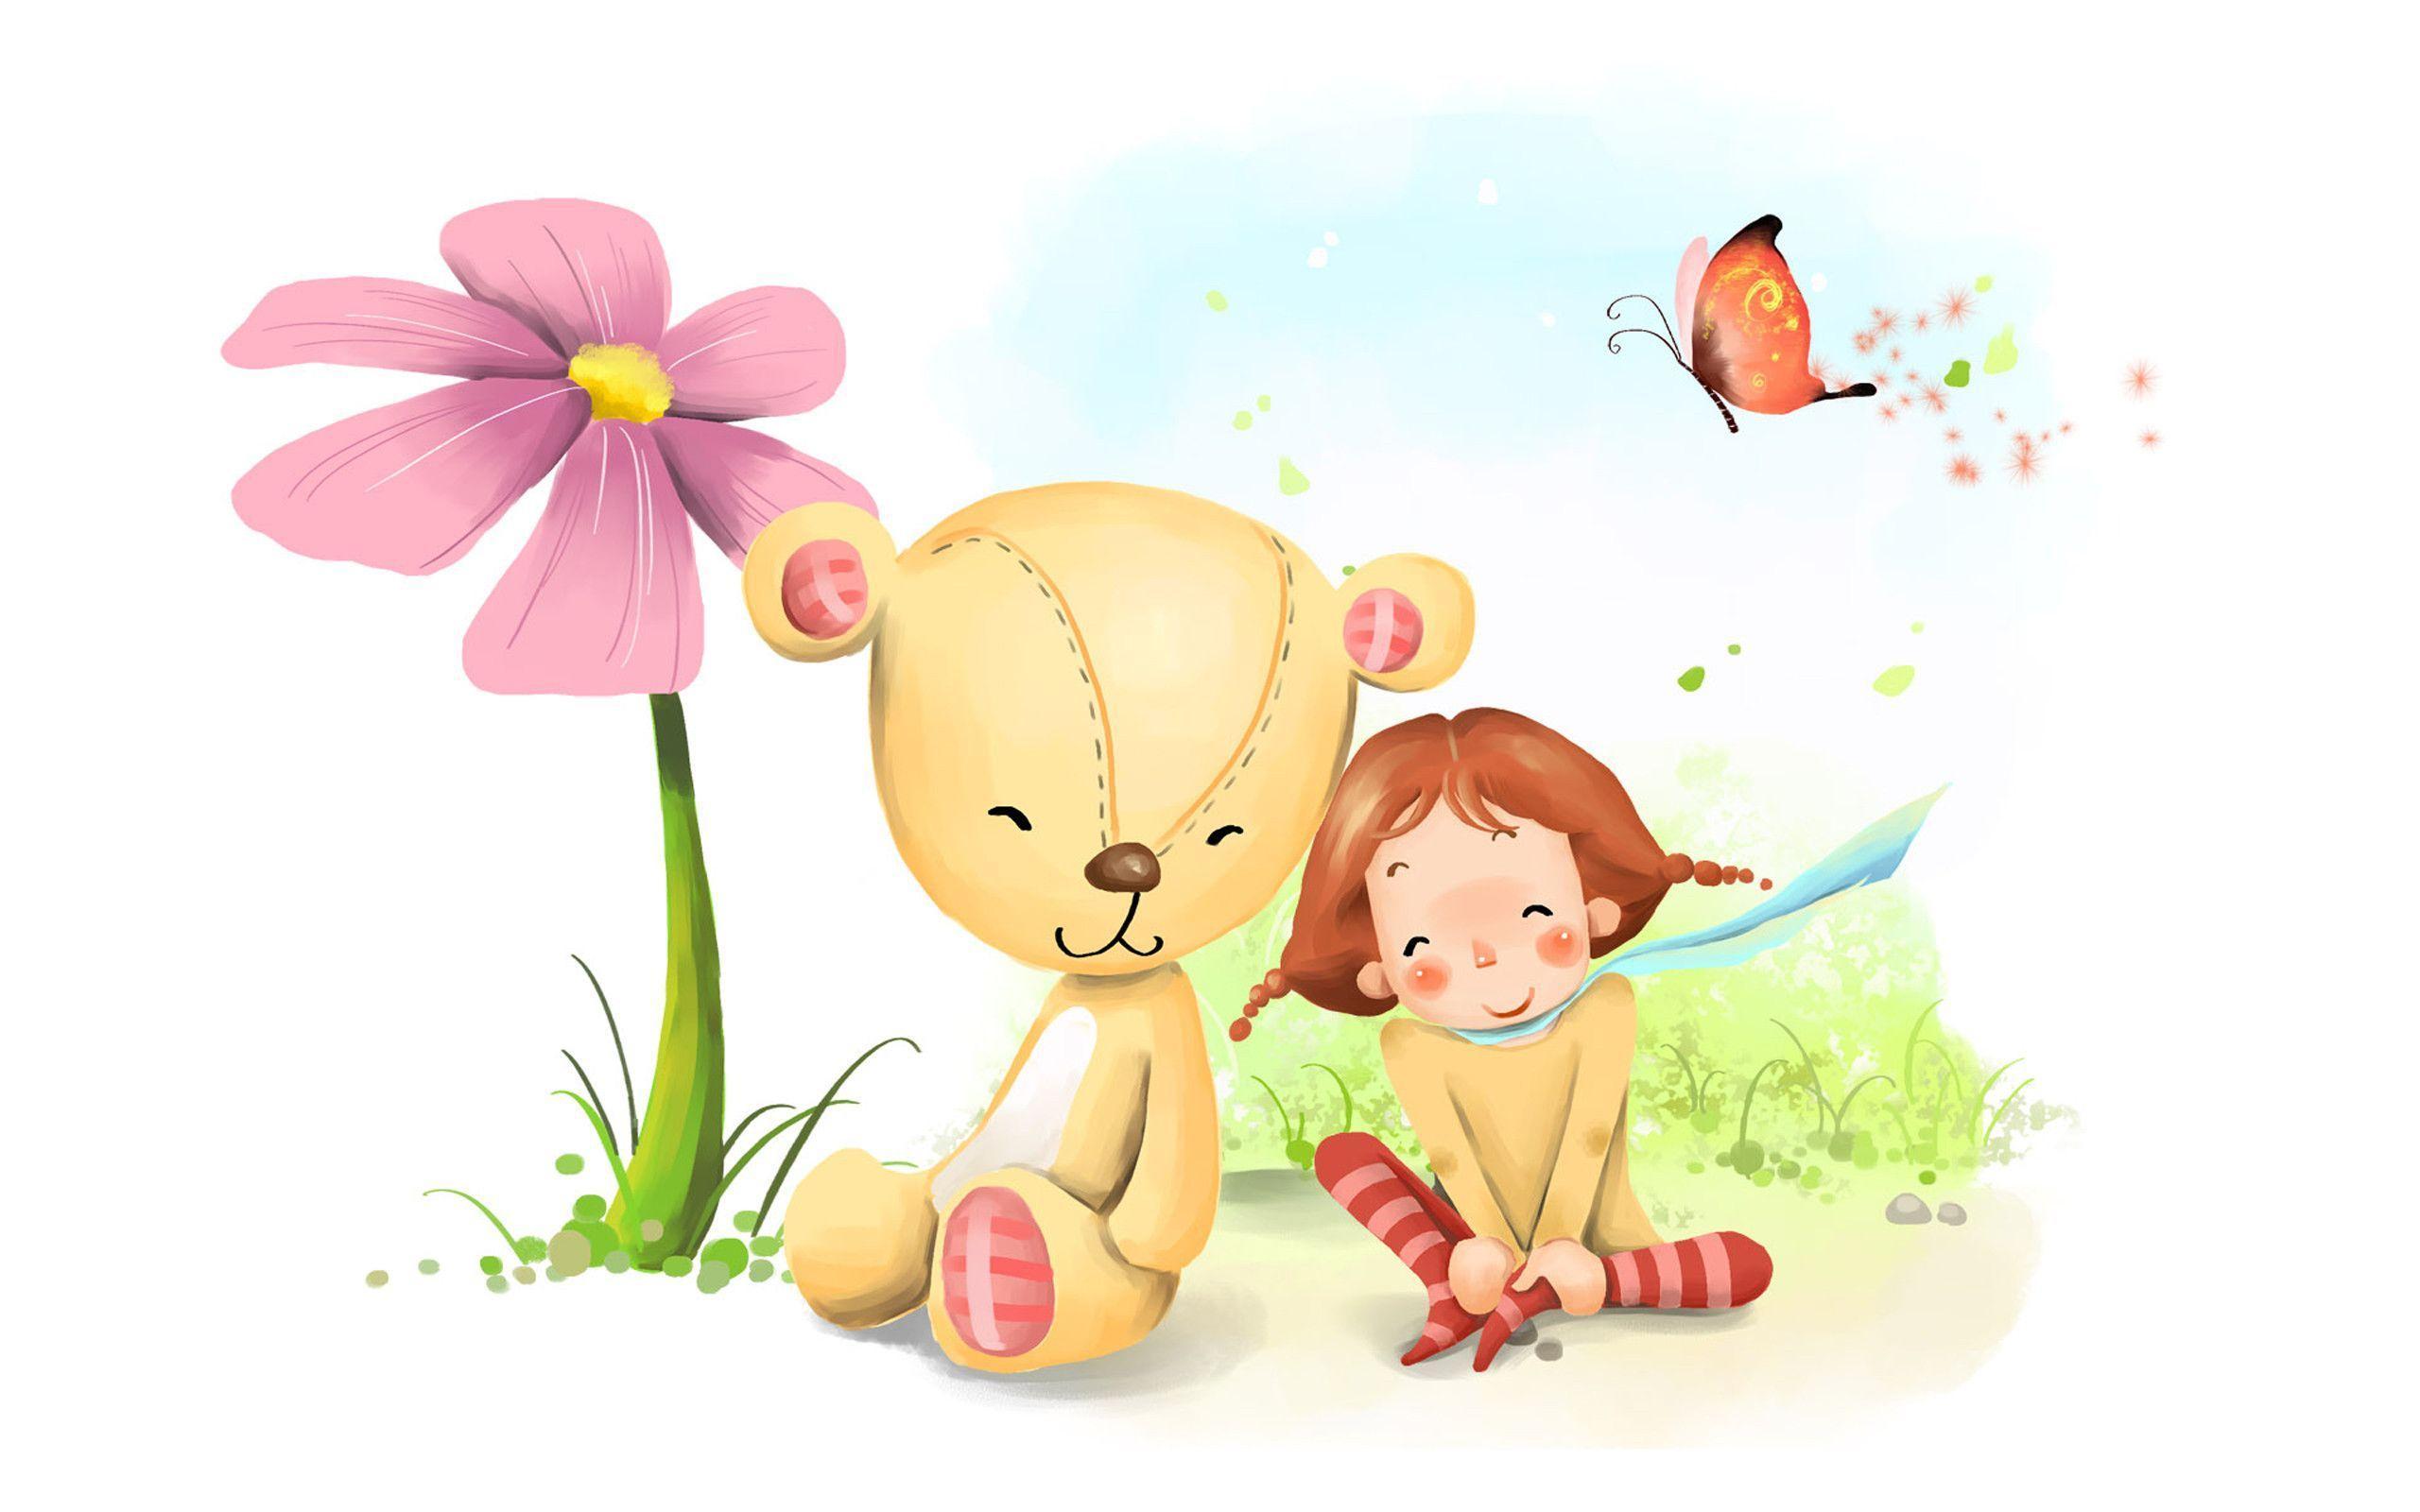 Unduh 53 Koleksi Wallpaper Animasi Teddy Bear HD Terbaik